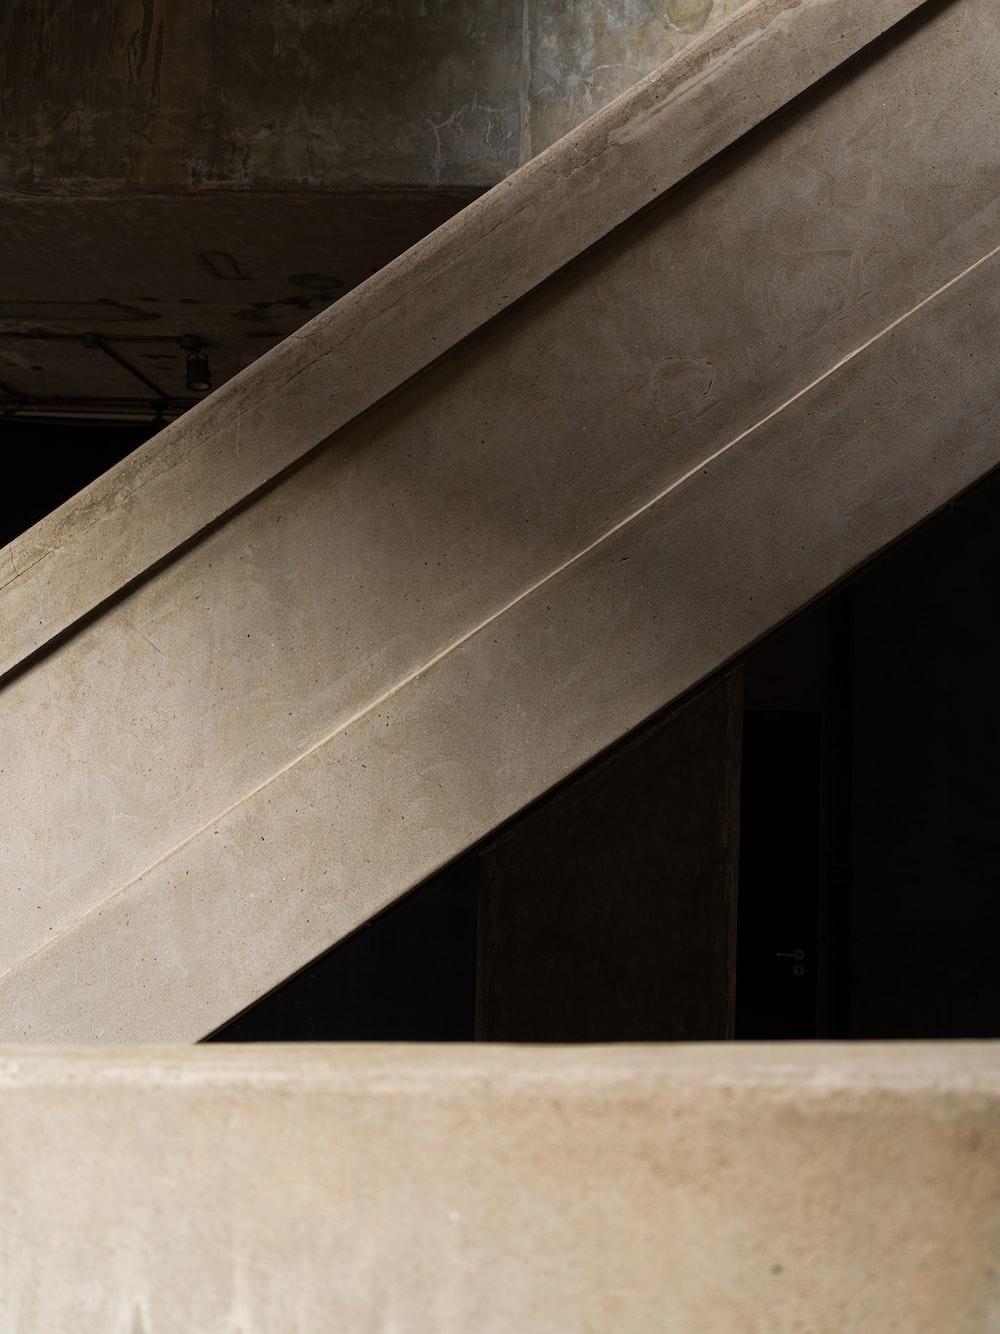 white concrete staircase during daytime